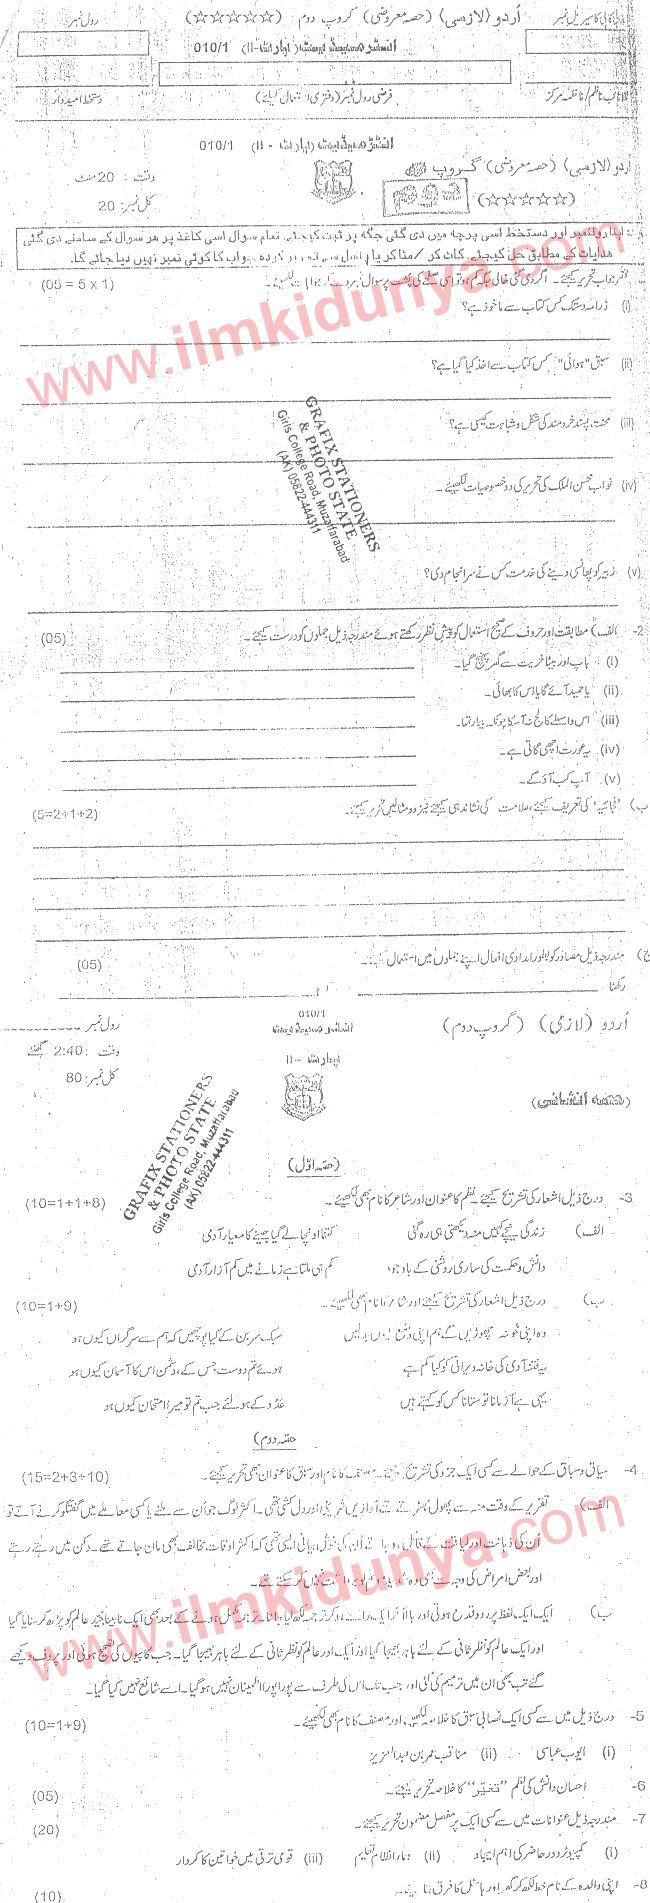 Past Papers 2010 AJK Board Inter Part 2 Urdu Group 2